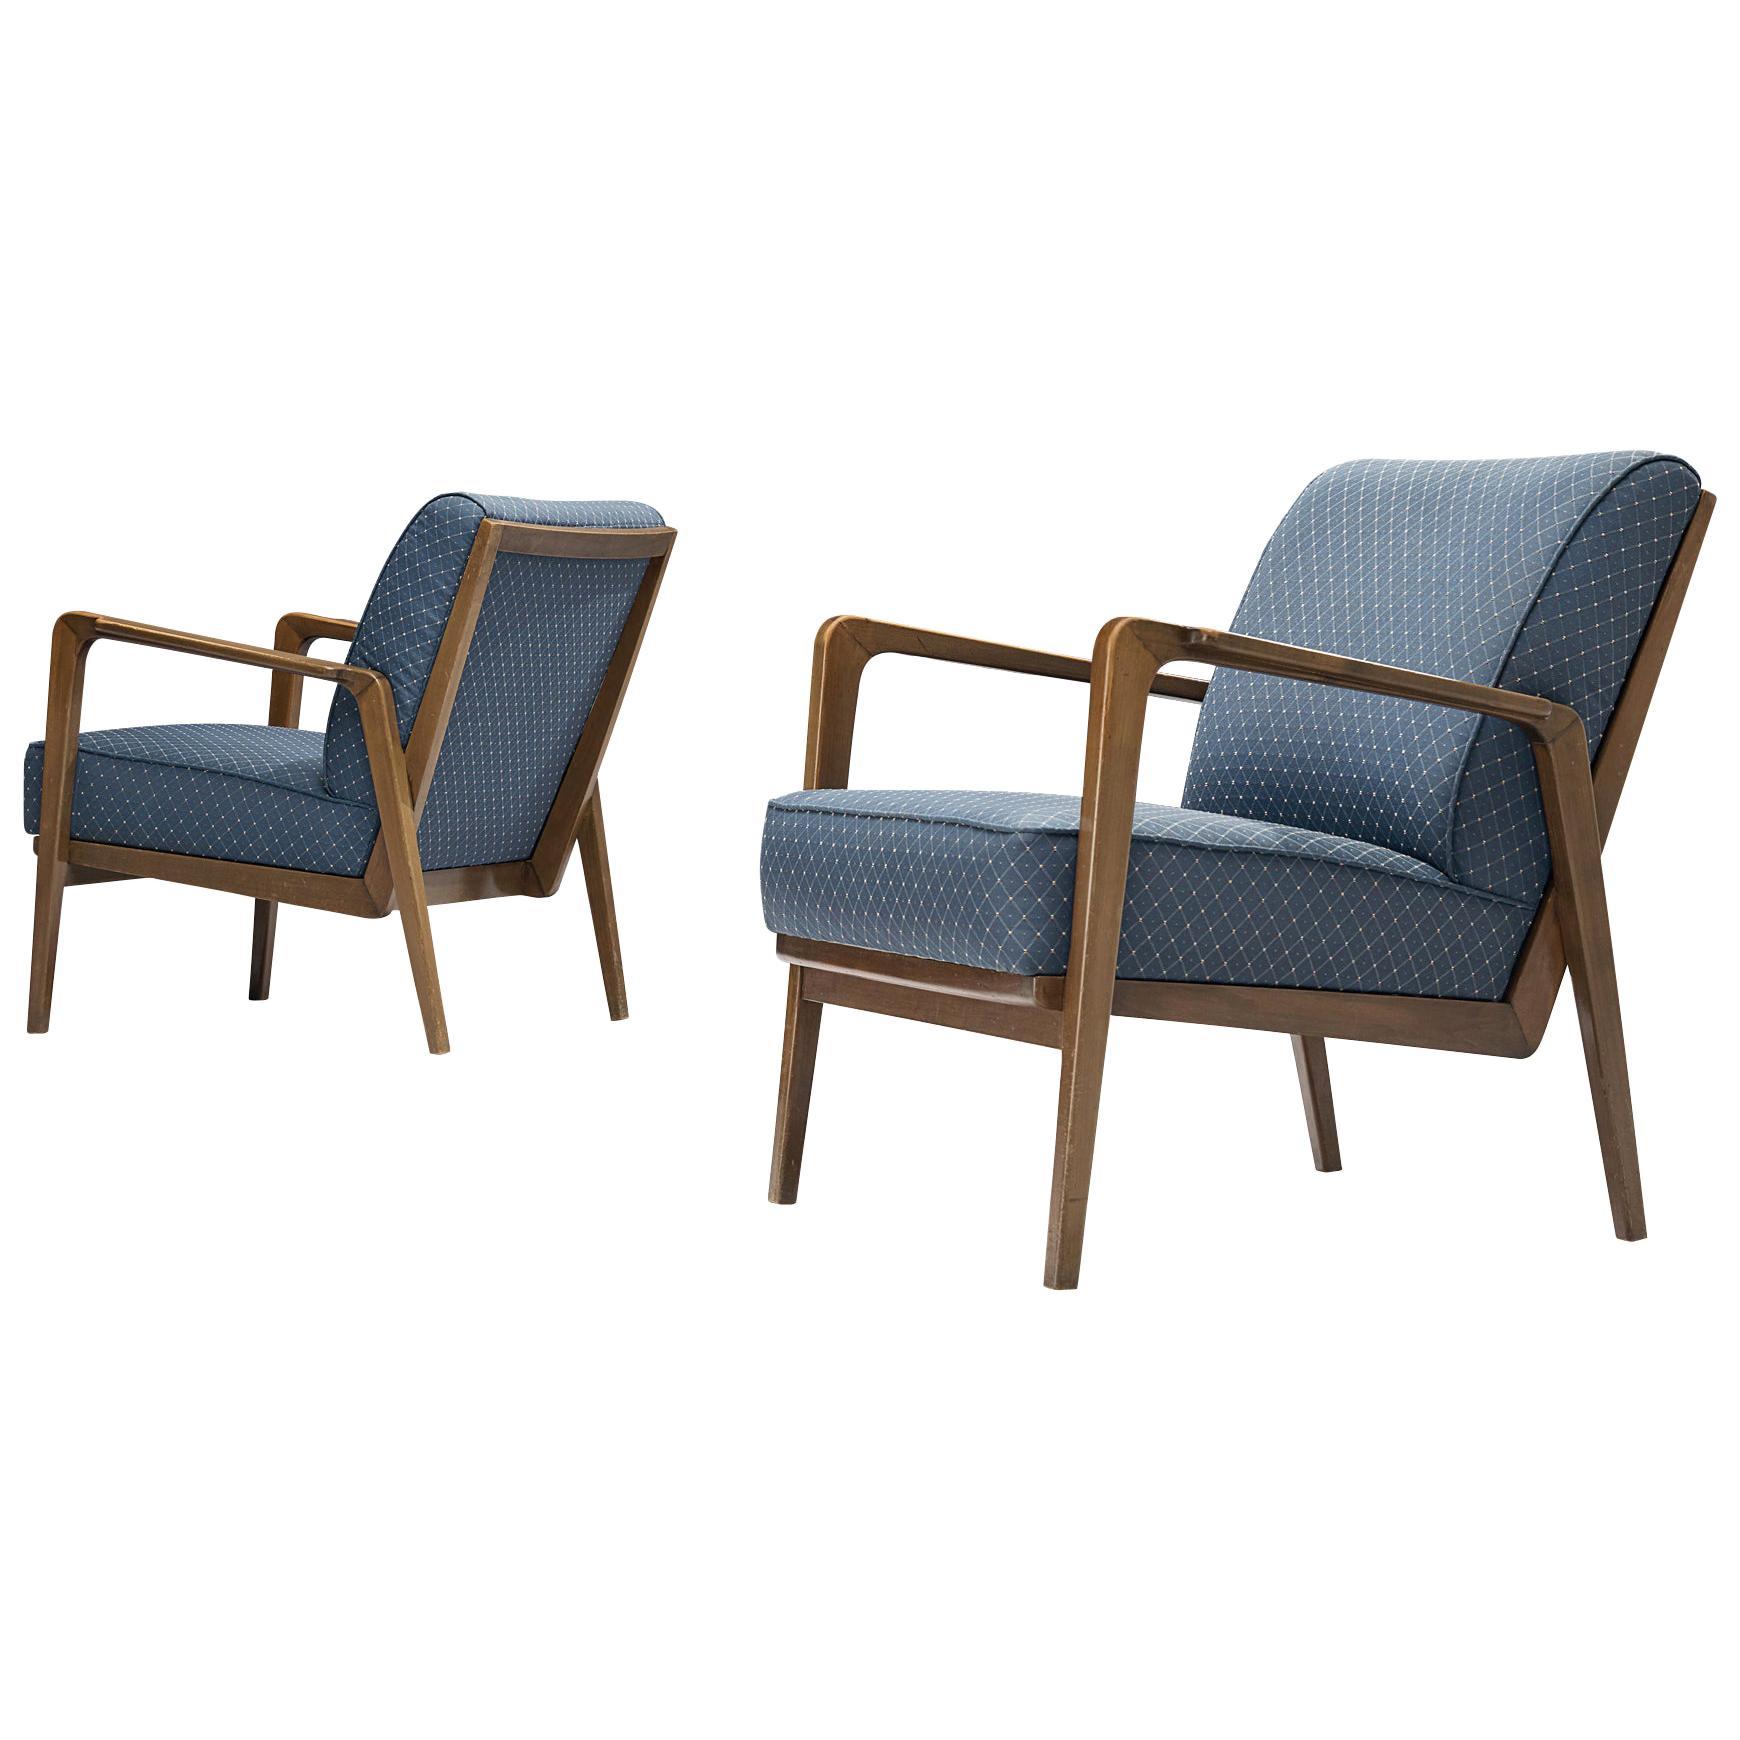 Emiel Veranneman Rare Lounge Chairs in Cherry and Blue Fabric